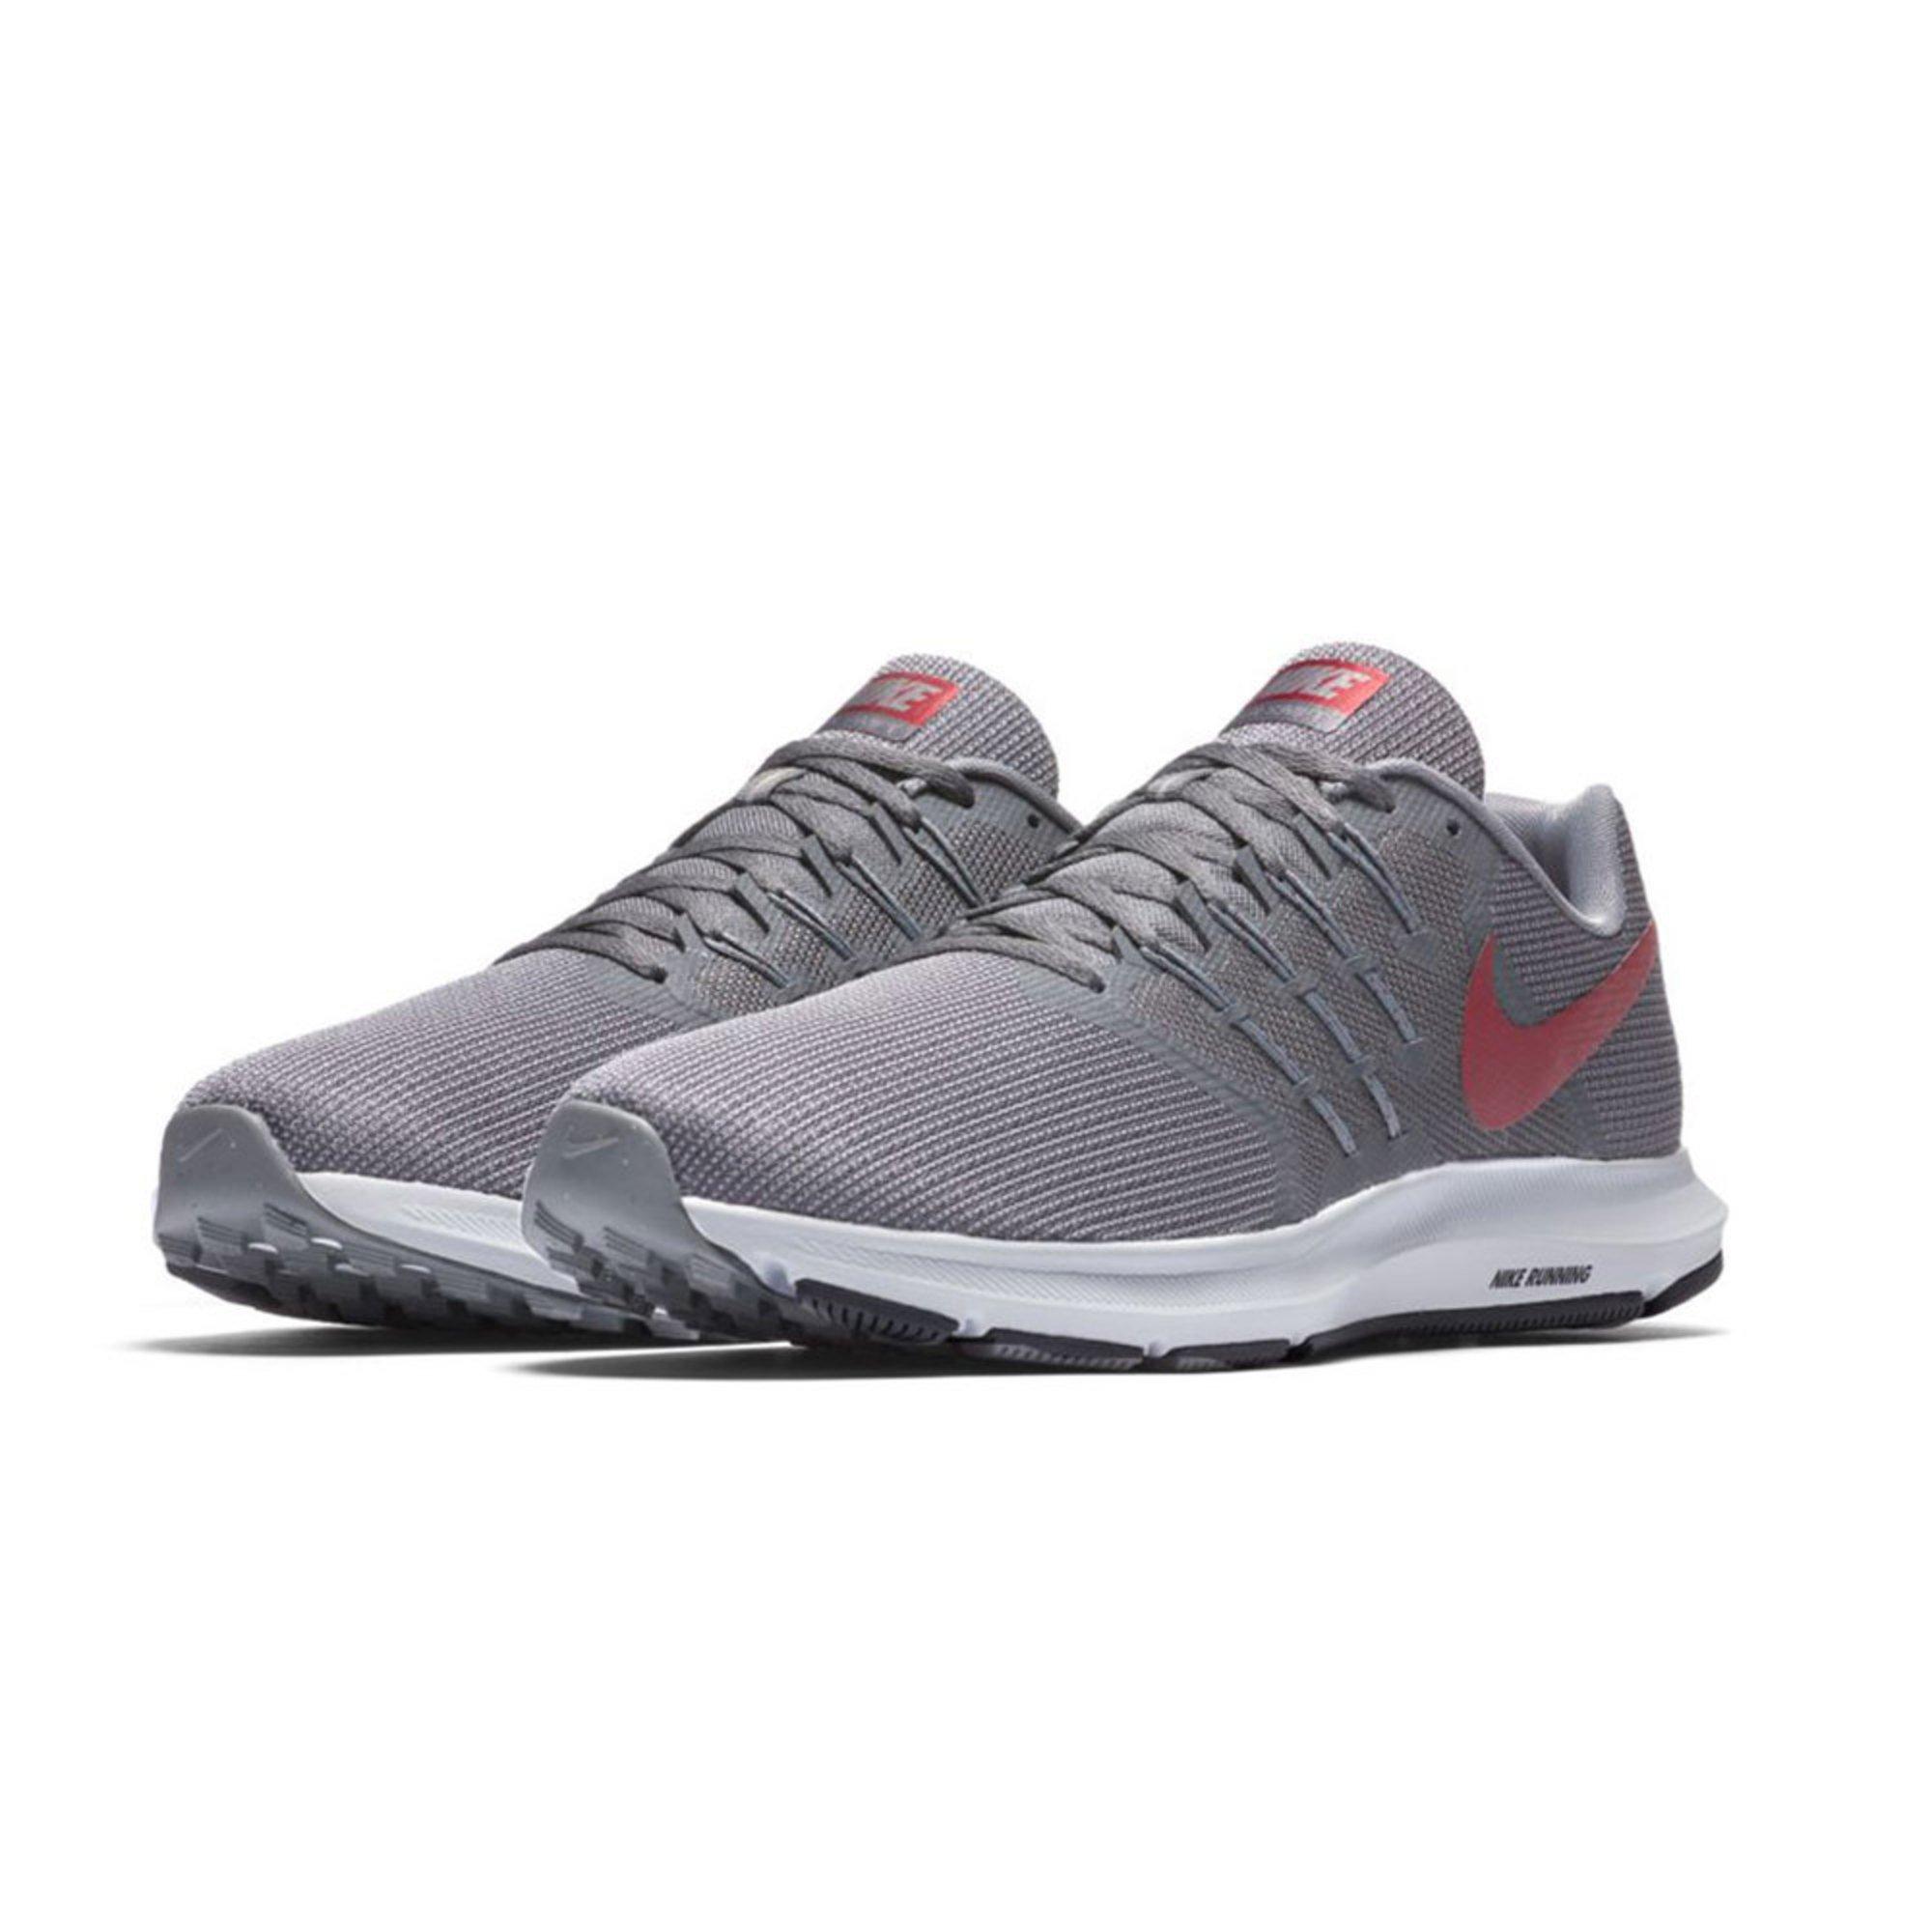 06f5bc77a7b Nike. Nike Men s Run Swift Running Shoe